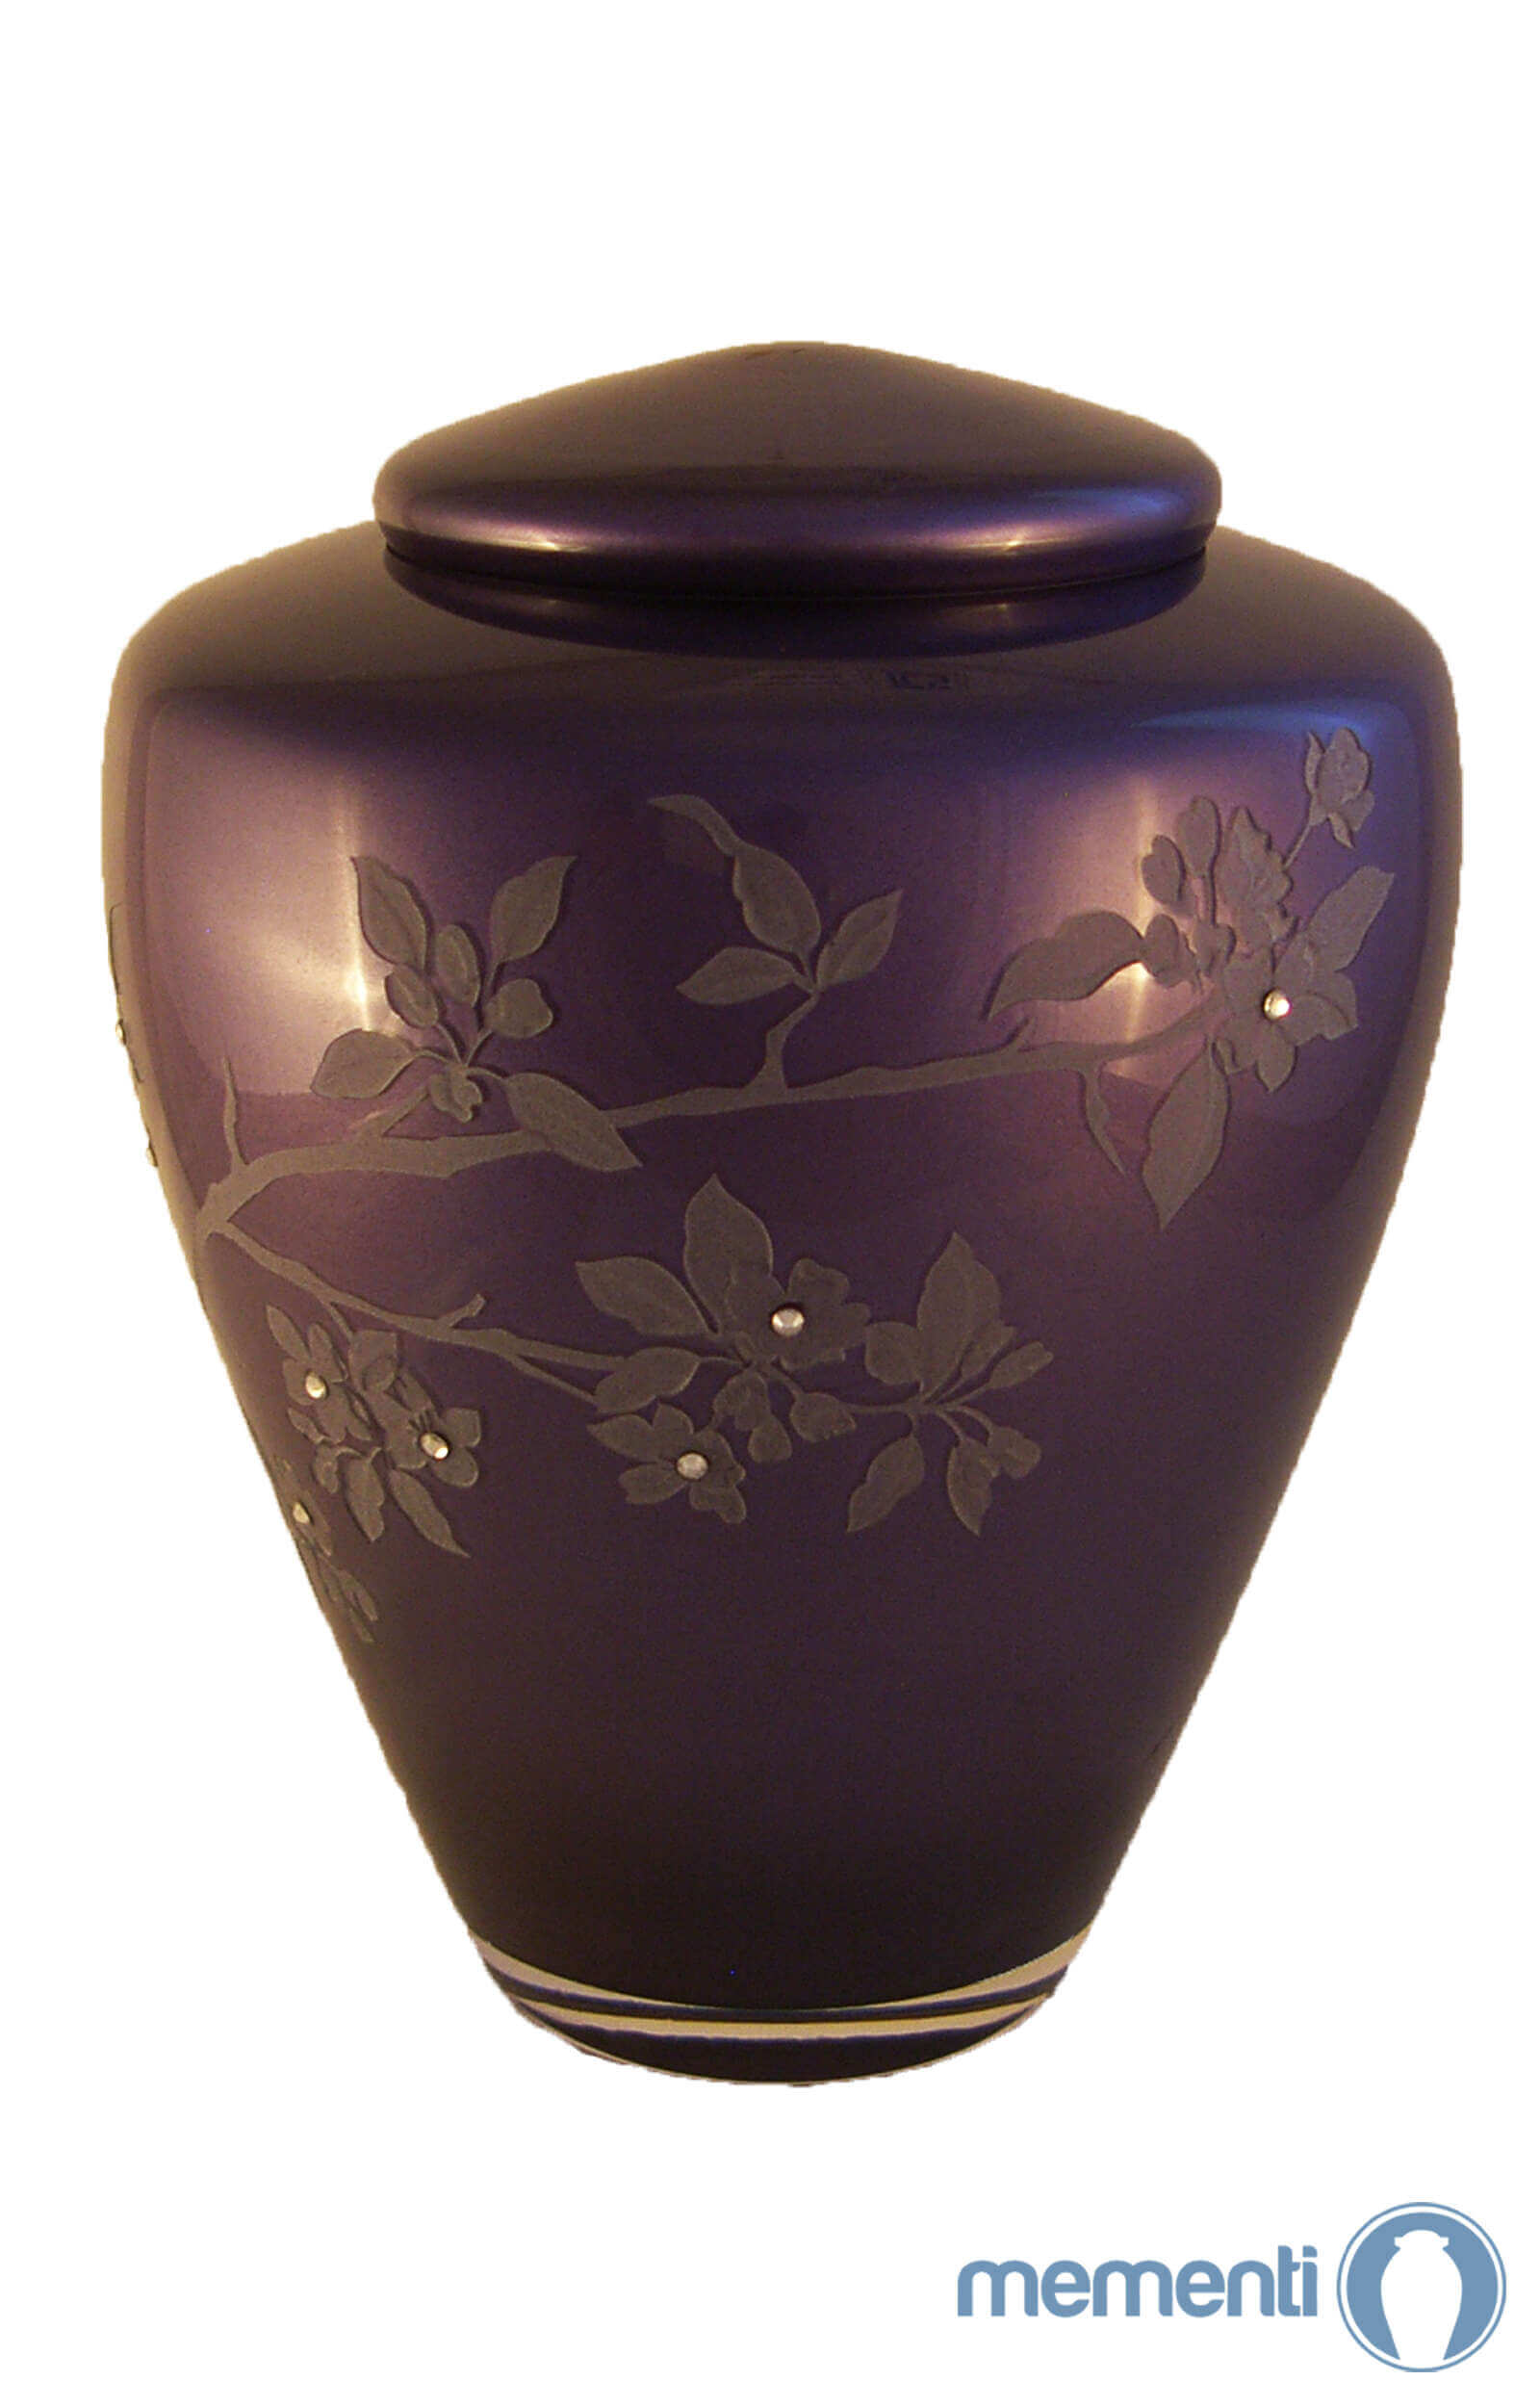 en G04 blossom deep purple glass urn